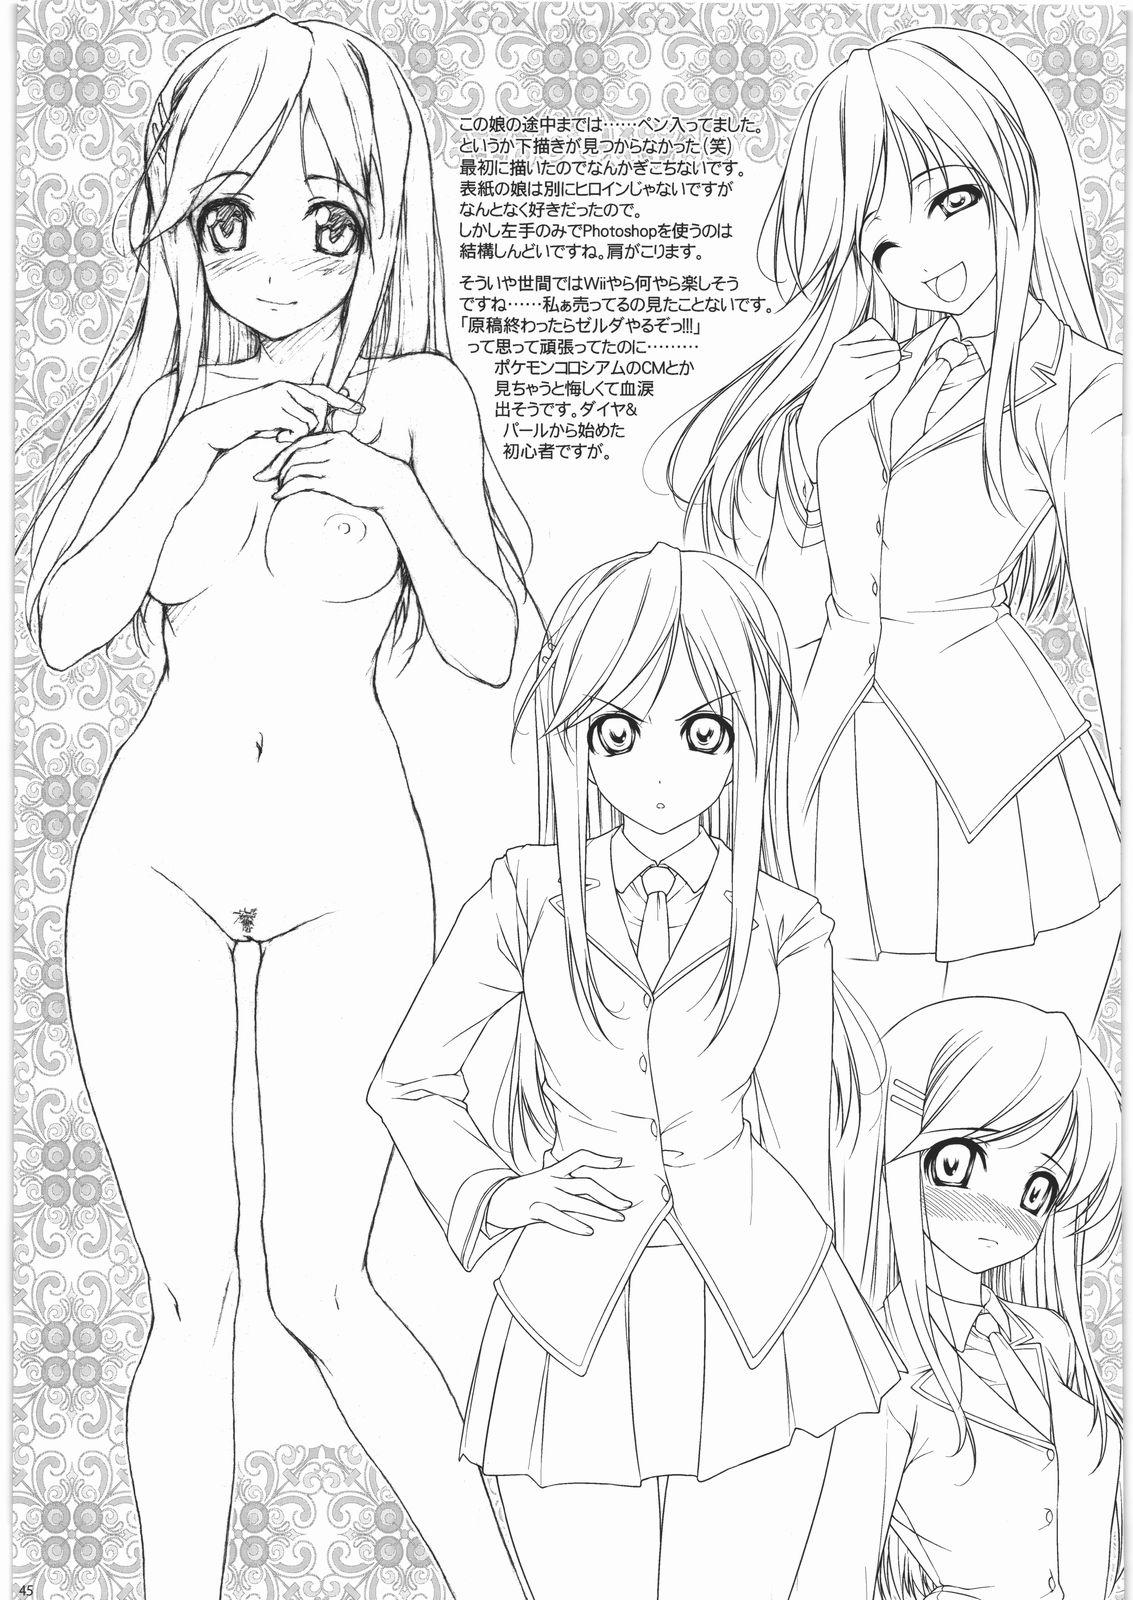 OmamatO Omakebon Matomemashita 43